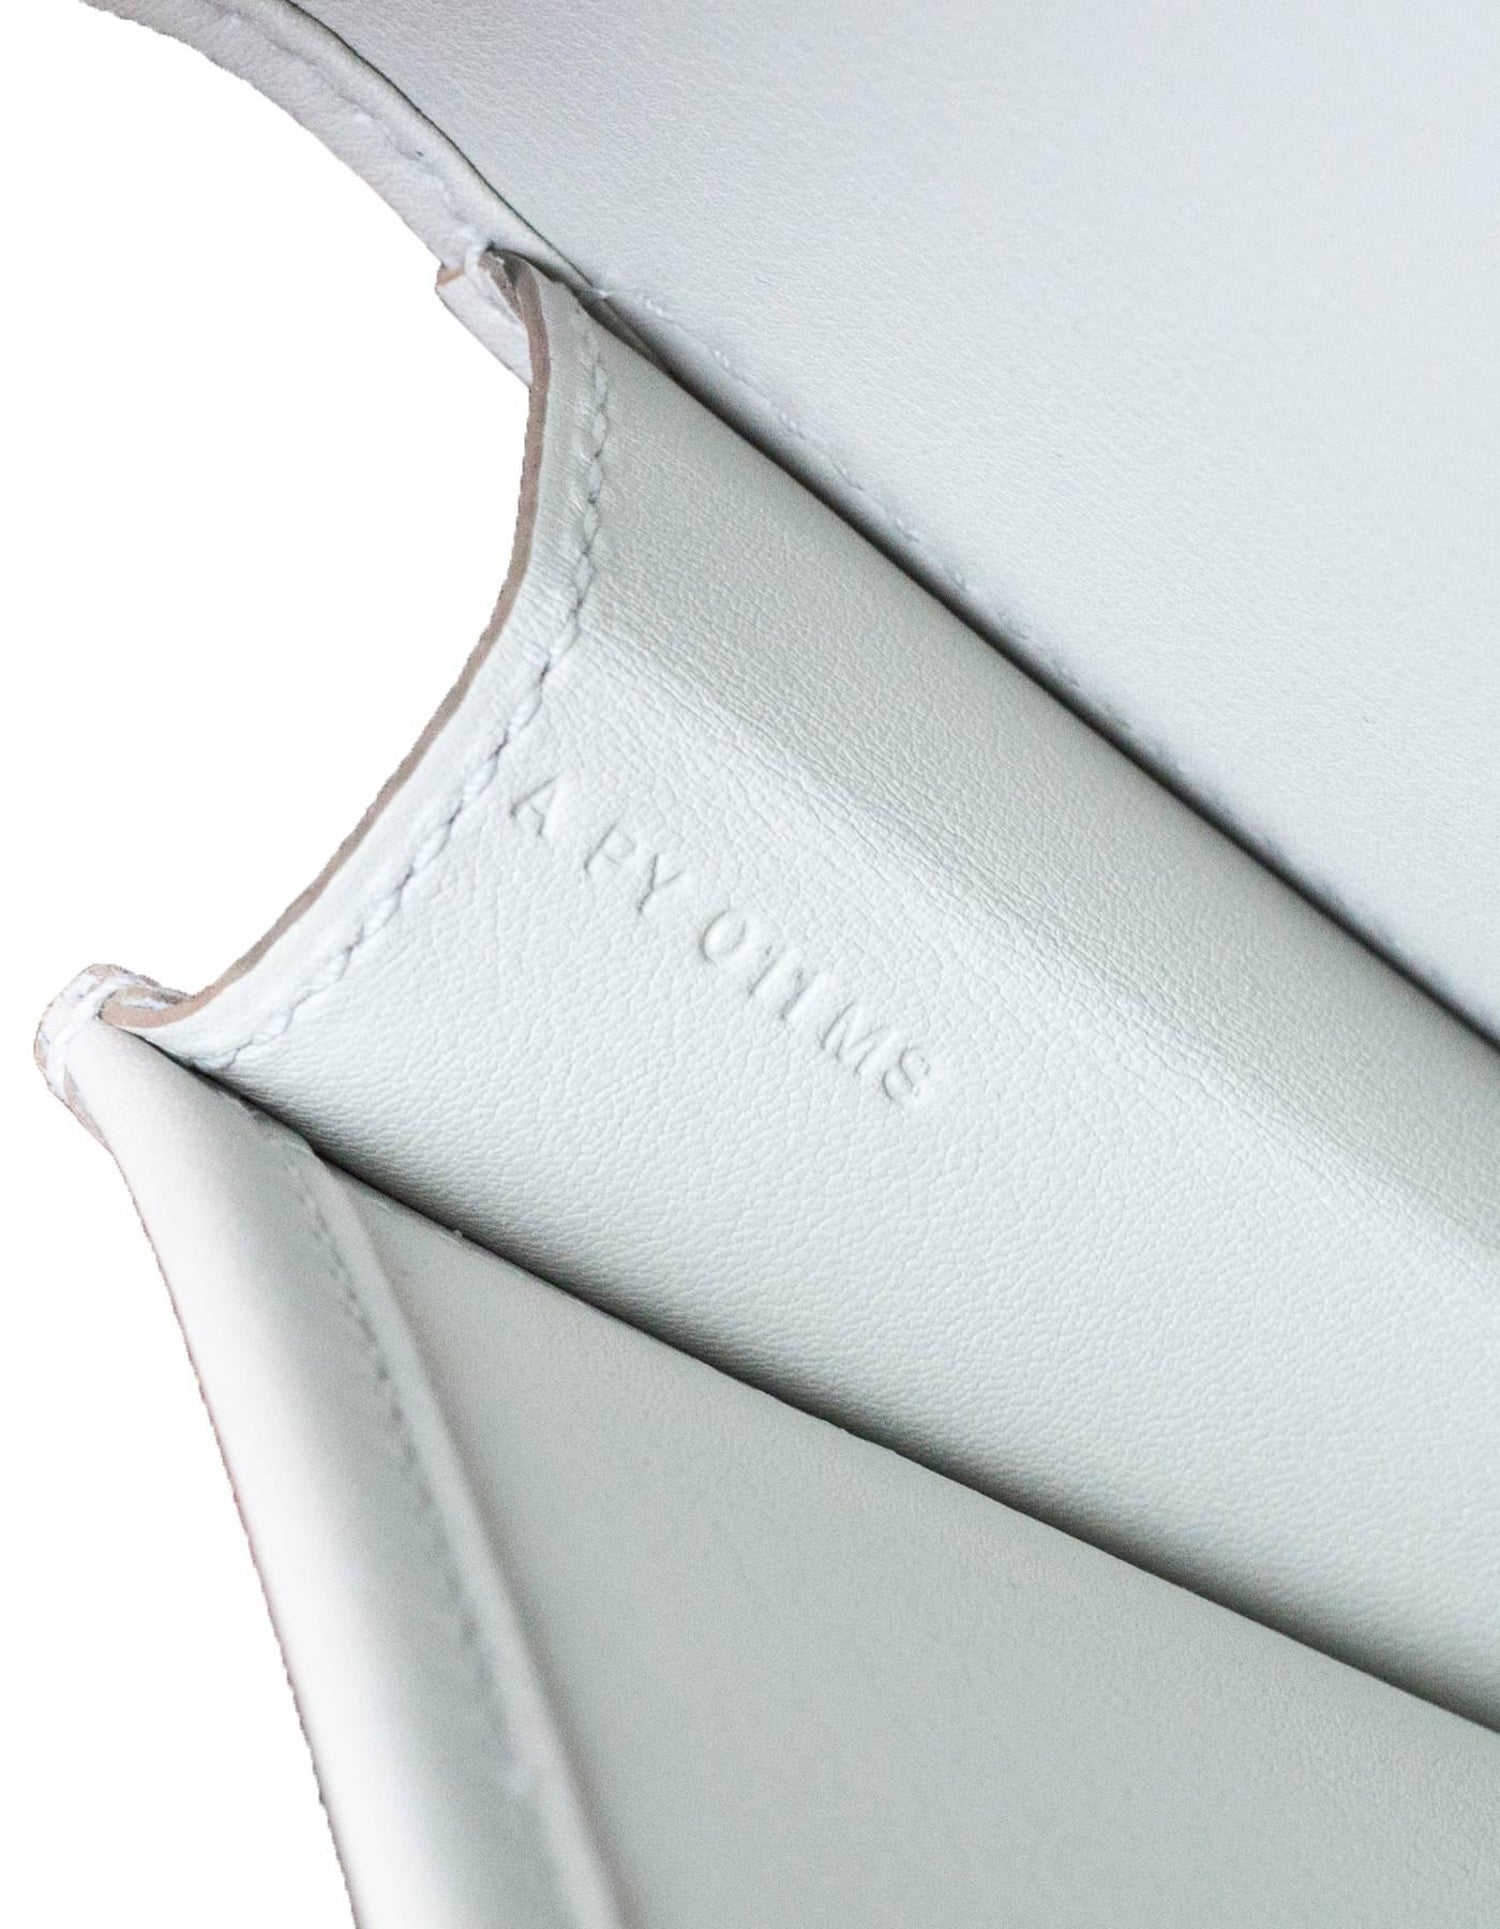 a34fe6de0914 Hermes 2017 Beton Off-White Swift Leather Jige Elan 29cm Clutch Bag For  Sale at 1stdibs